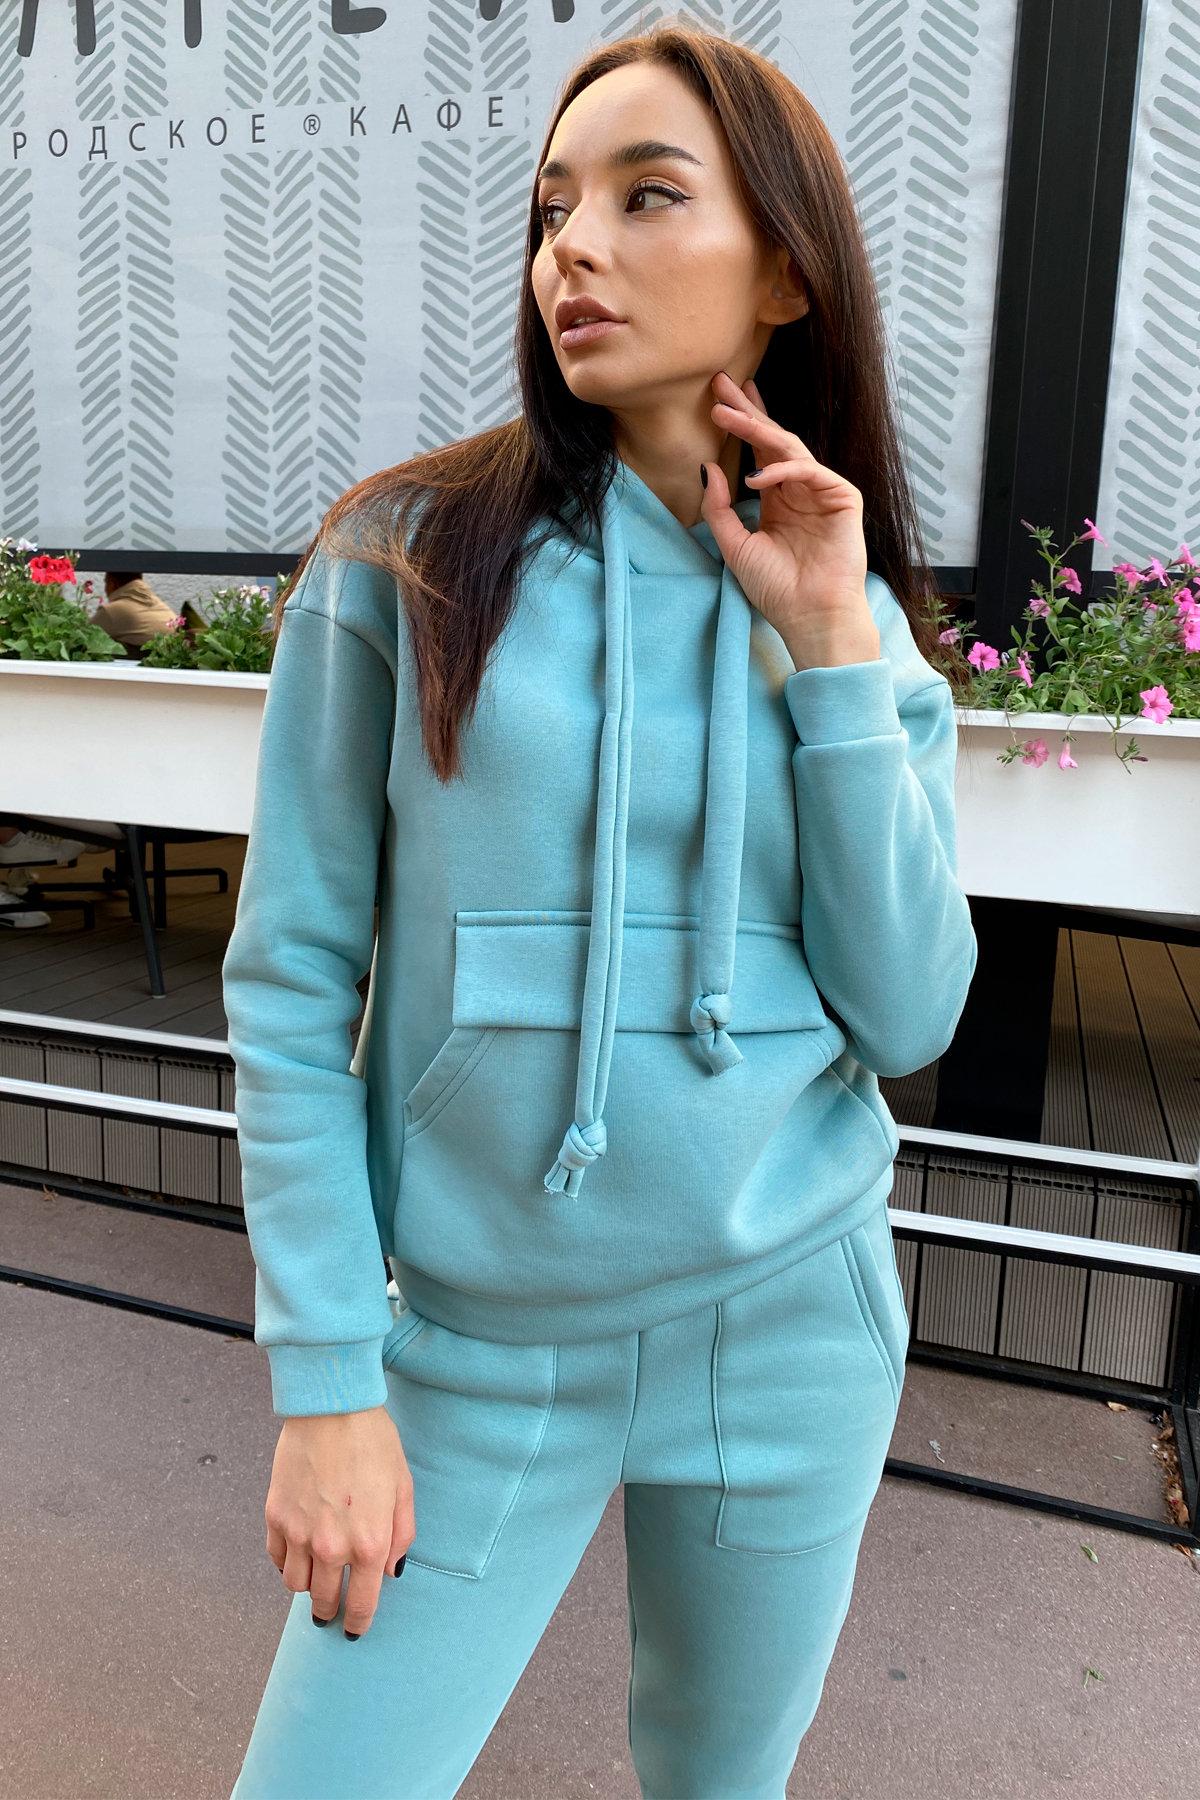 Бруклин  прогулочный костюм 3х нитка с начесом  9663 АРТ. 45960 Цвет: Олива - фото 4, интернет магазин tm-modus.ru